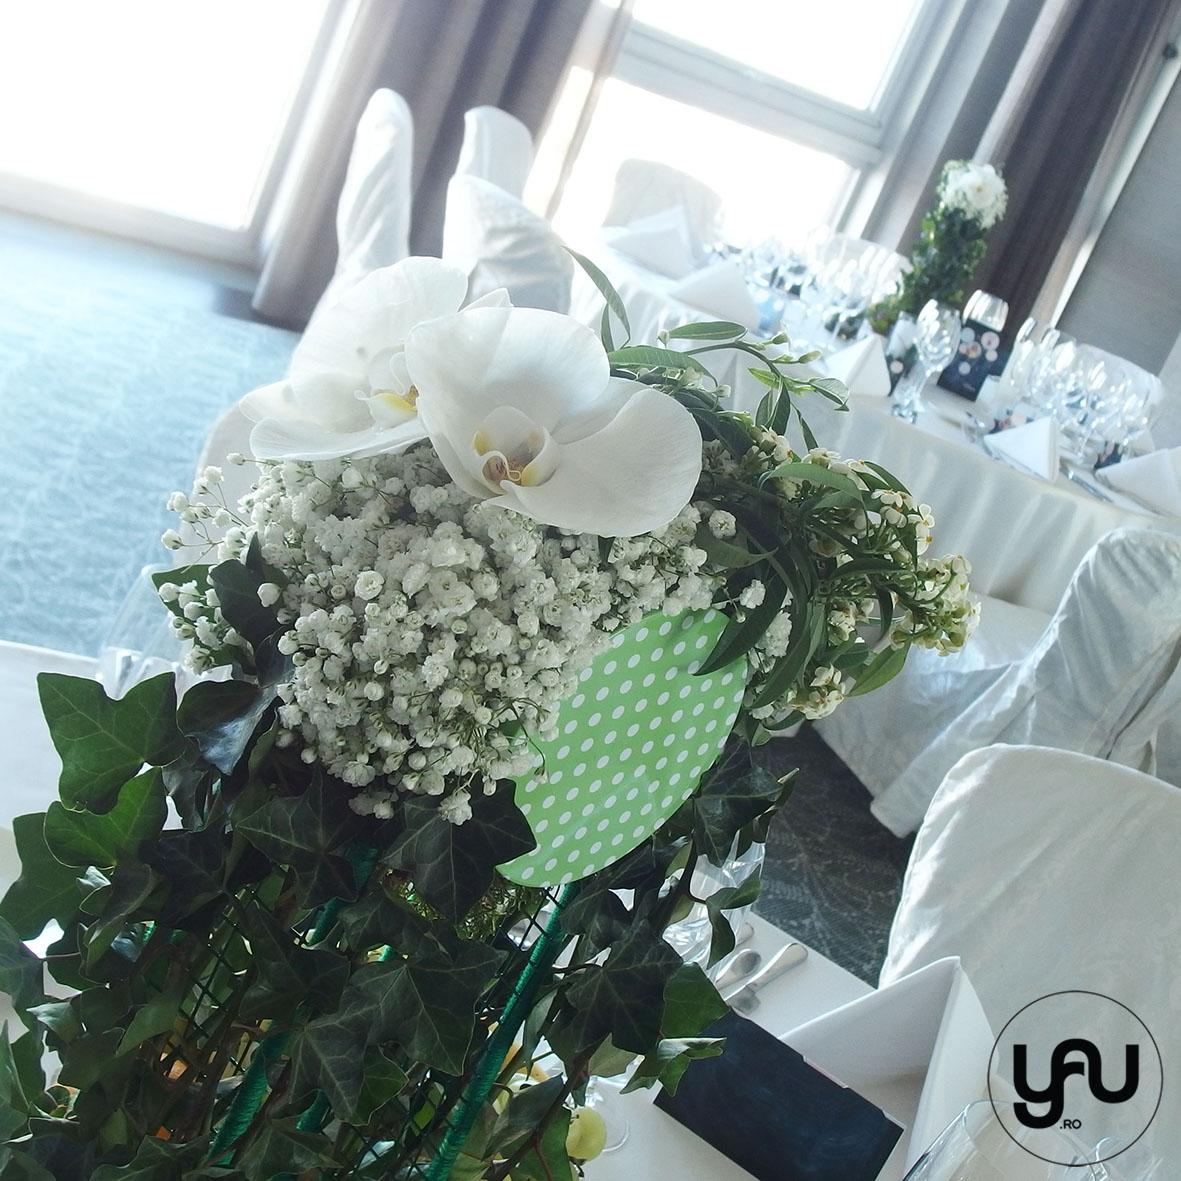 nunta-si-botez-cu-flori-albe-linie-punct-_-yau-events-2016-_-hotel-intercontinental-_-elenatoader-4